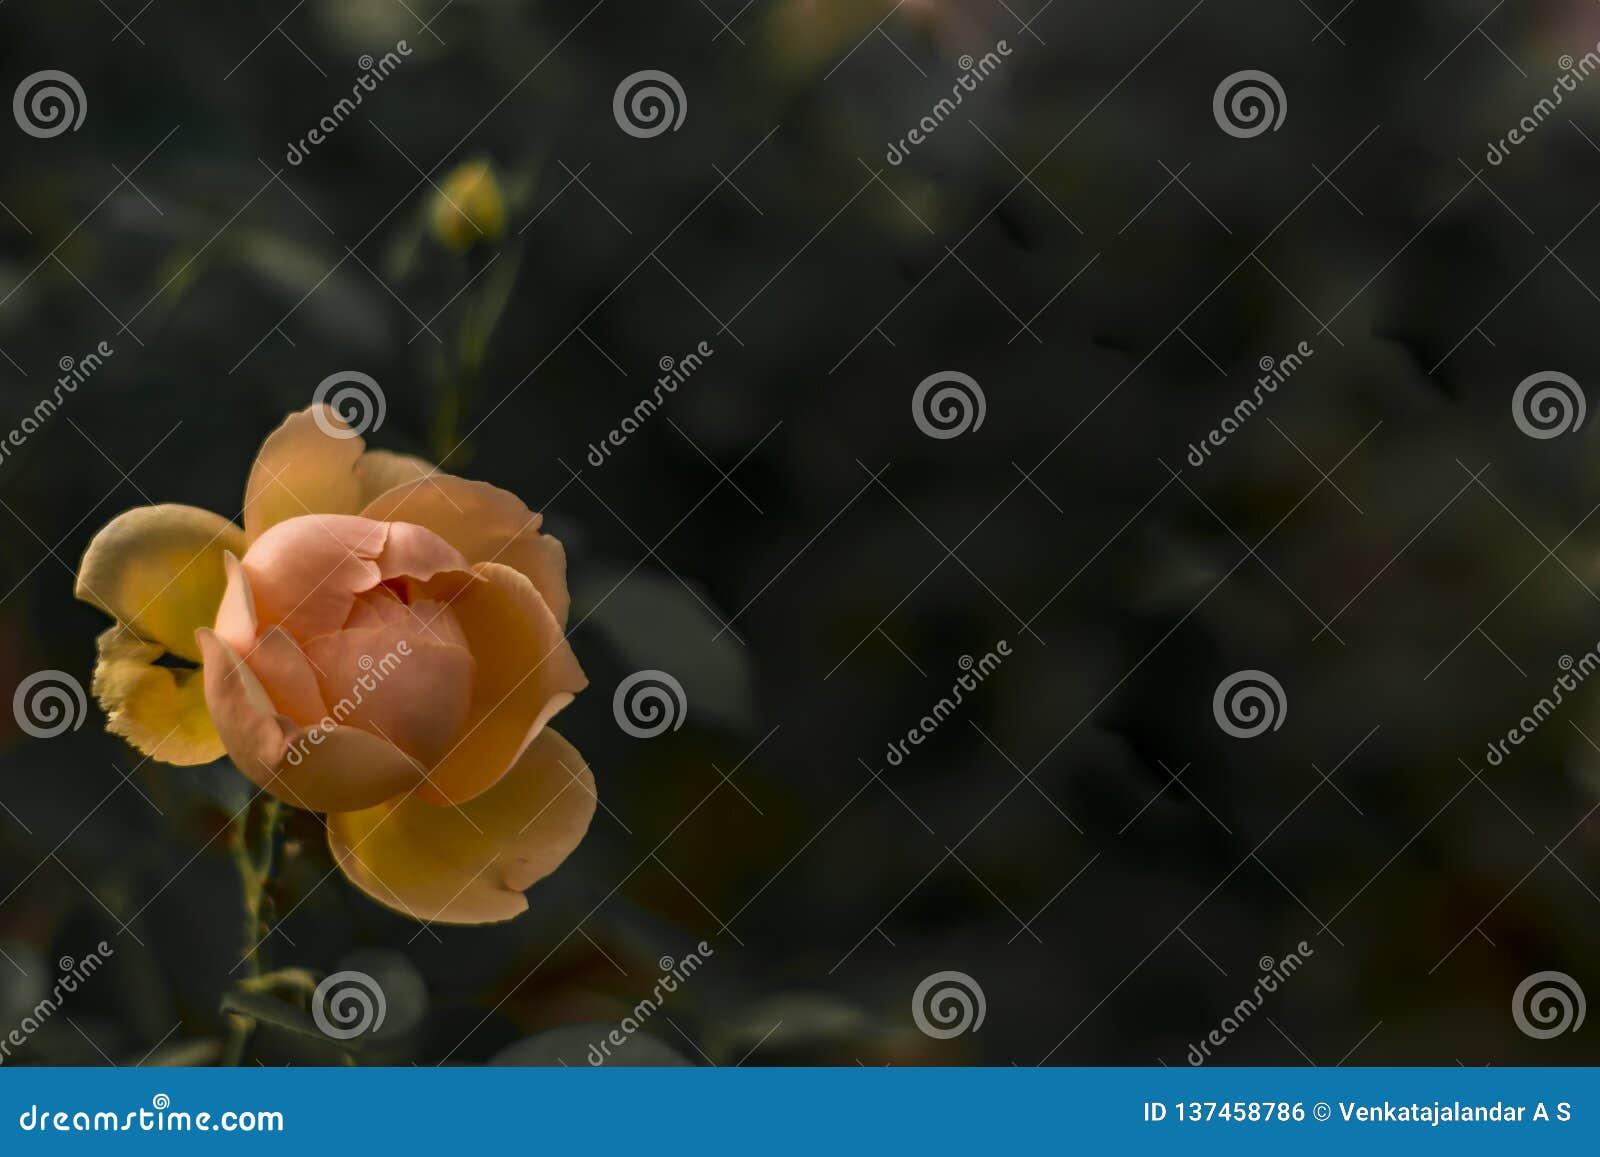 Geïsoleerde Oranje Rose Flower met donkere achtergrond